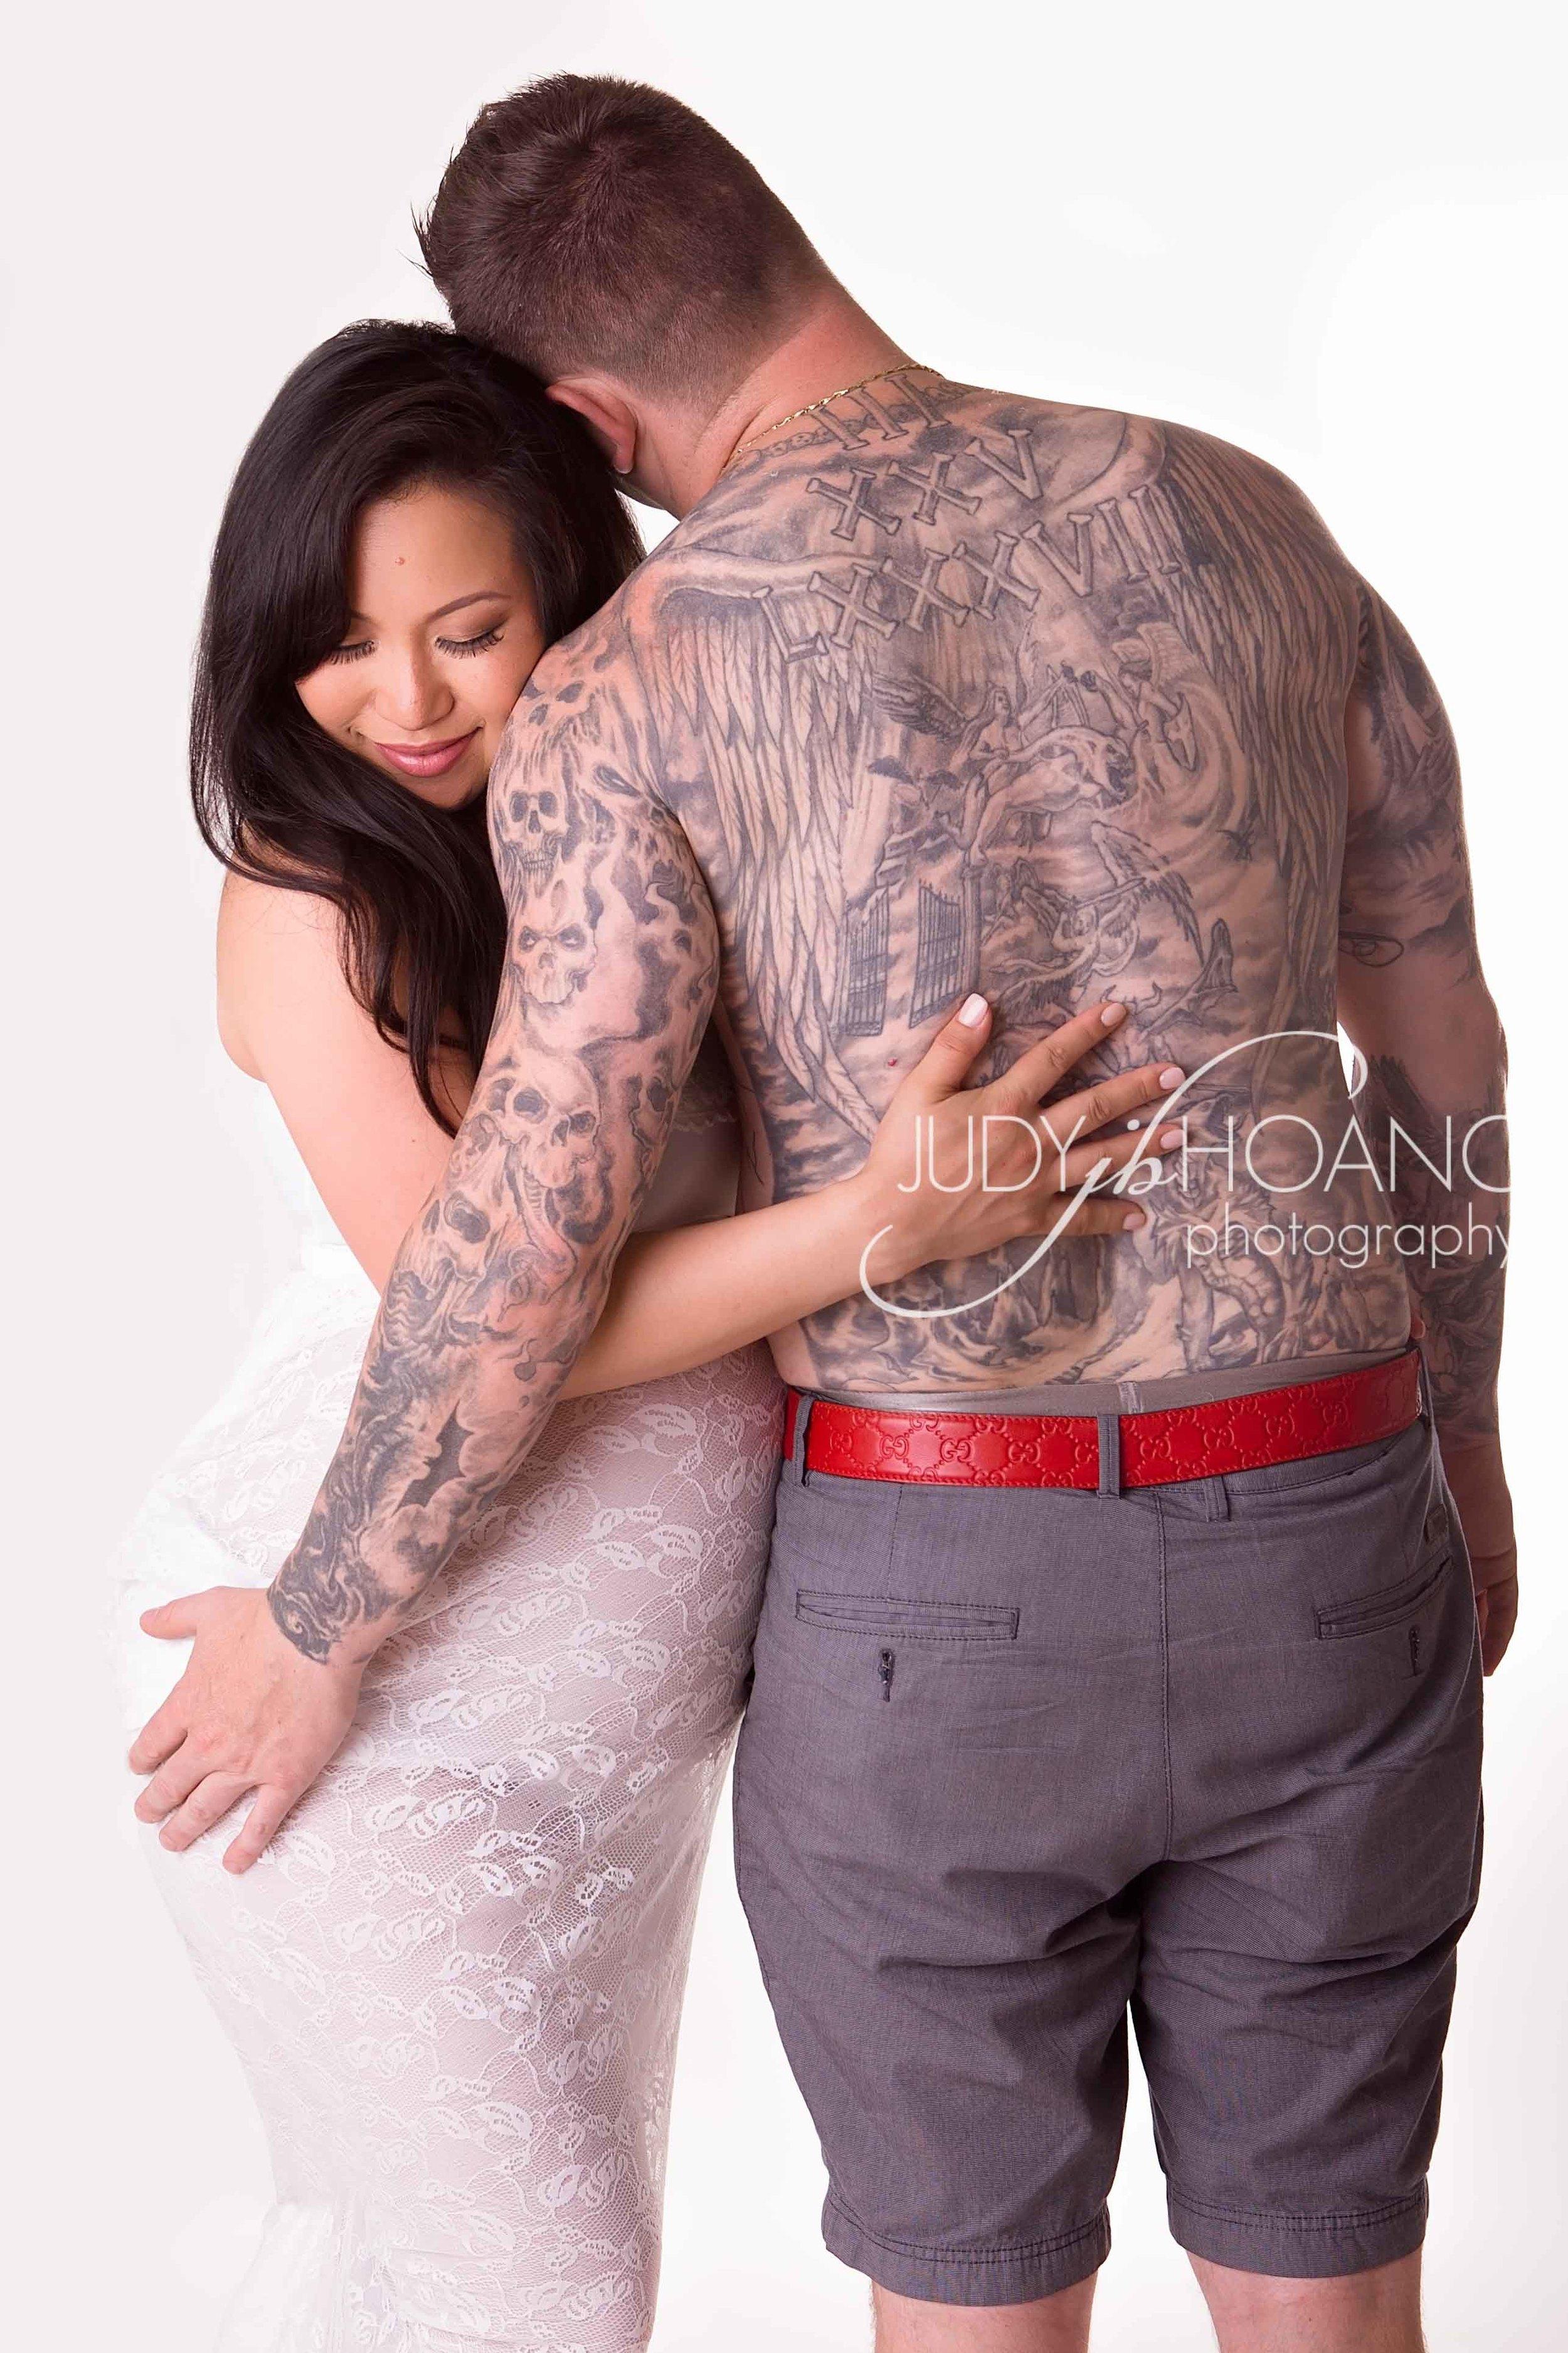 Judy Hoang Photography - Lisa Website-2.jpg